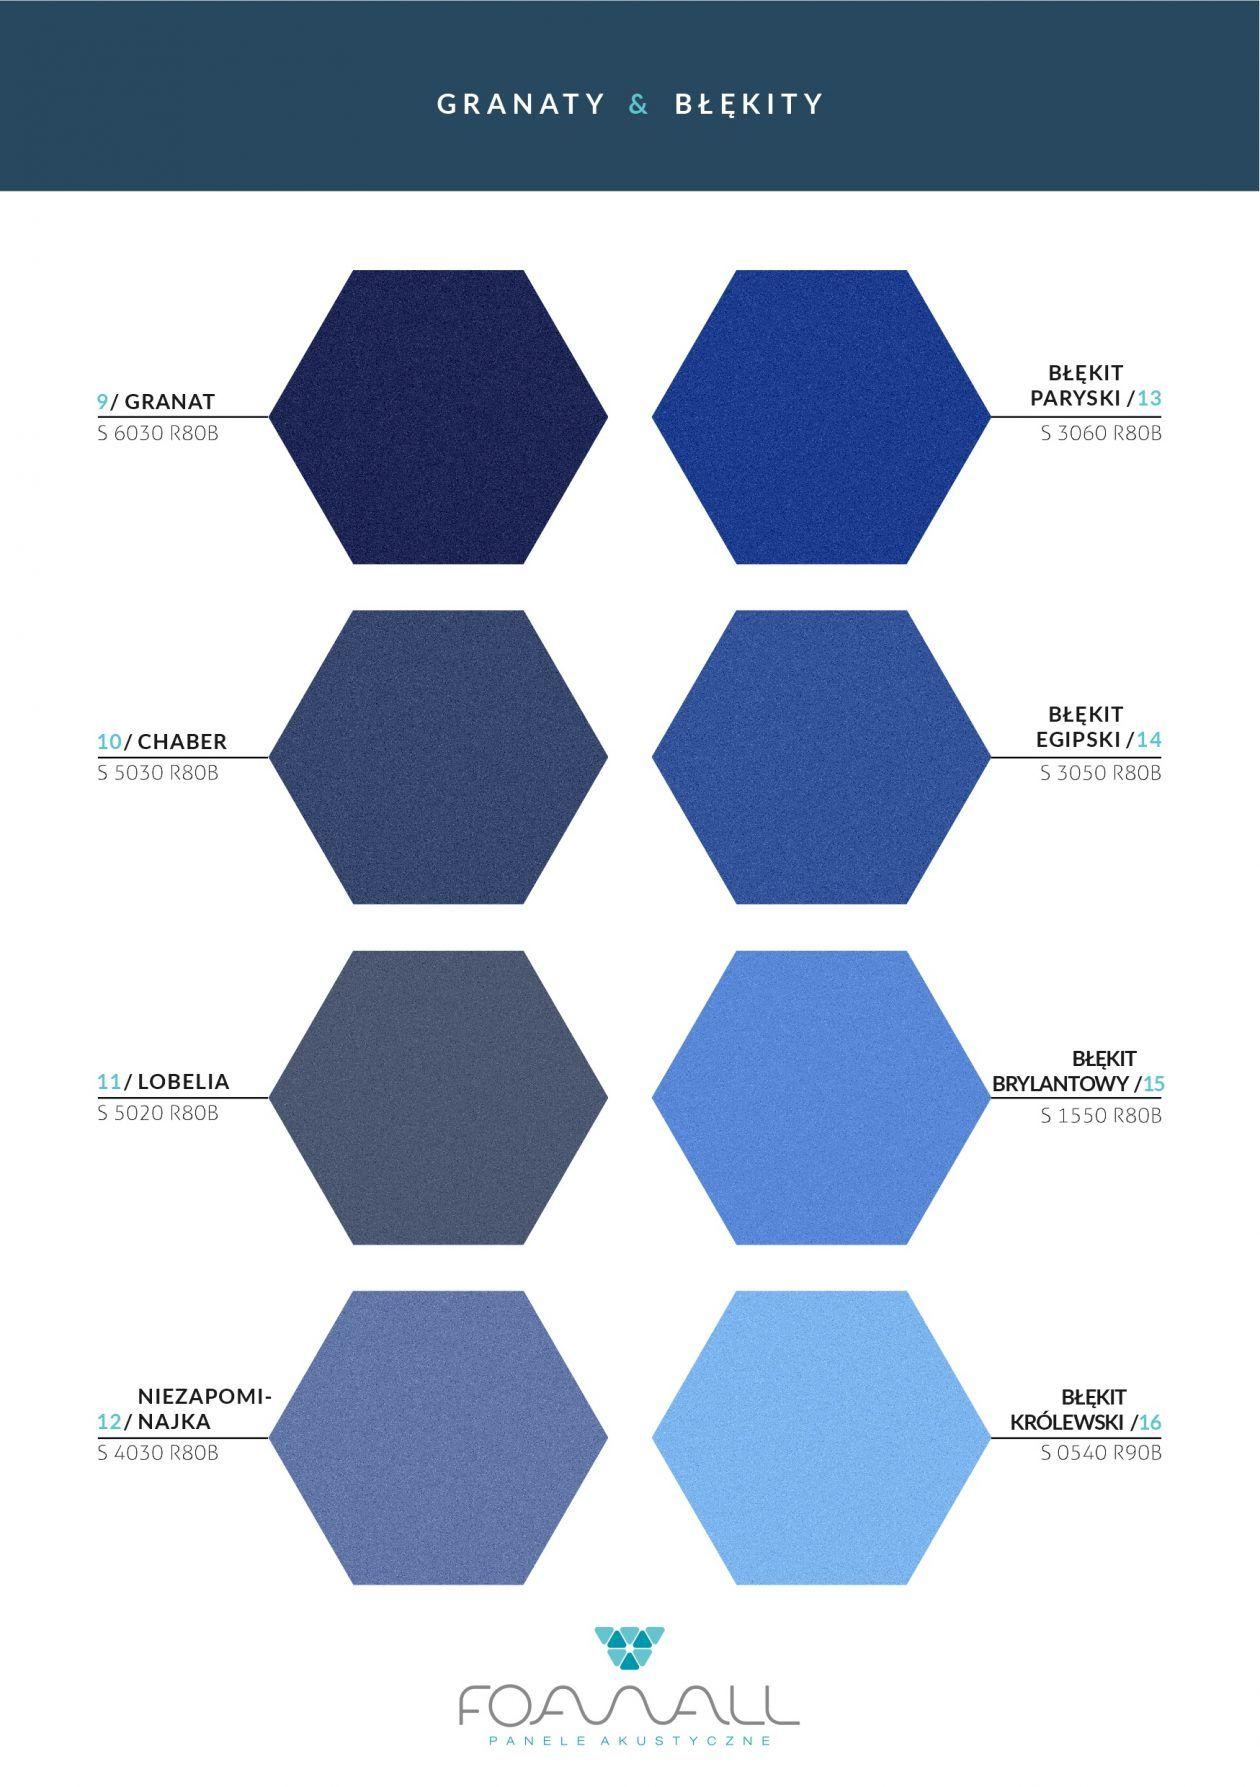 Heksagon Na Sciane Panel Piankowy Mymodulo Sklep Decor Paneling Home Decor